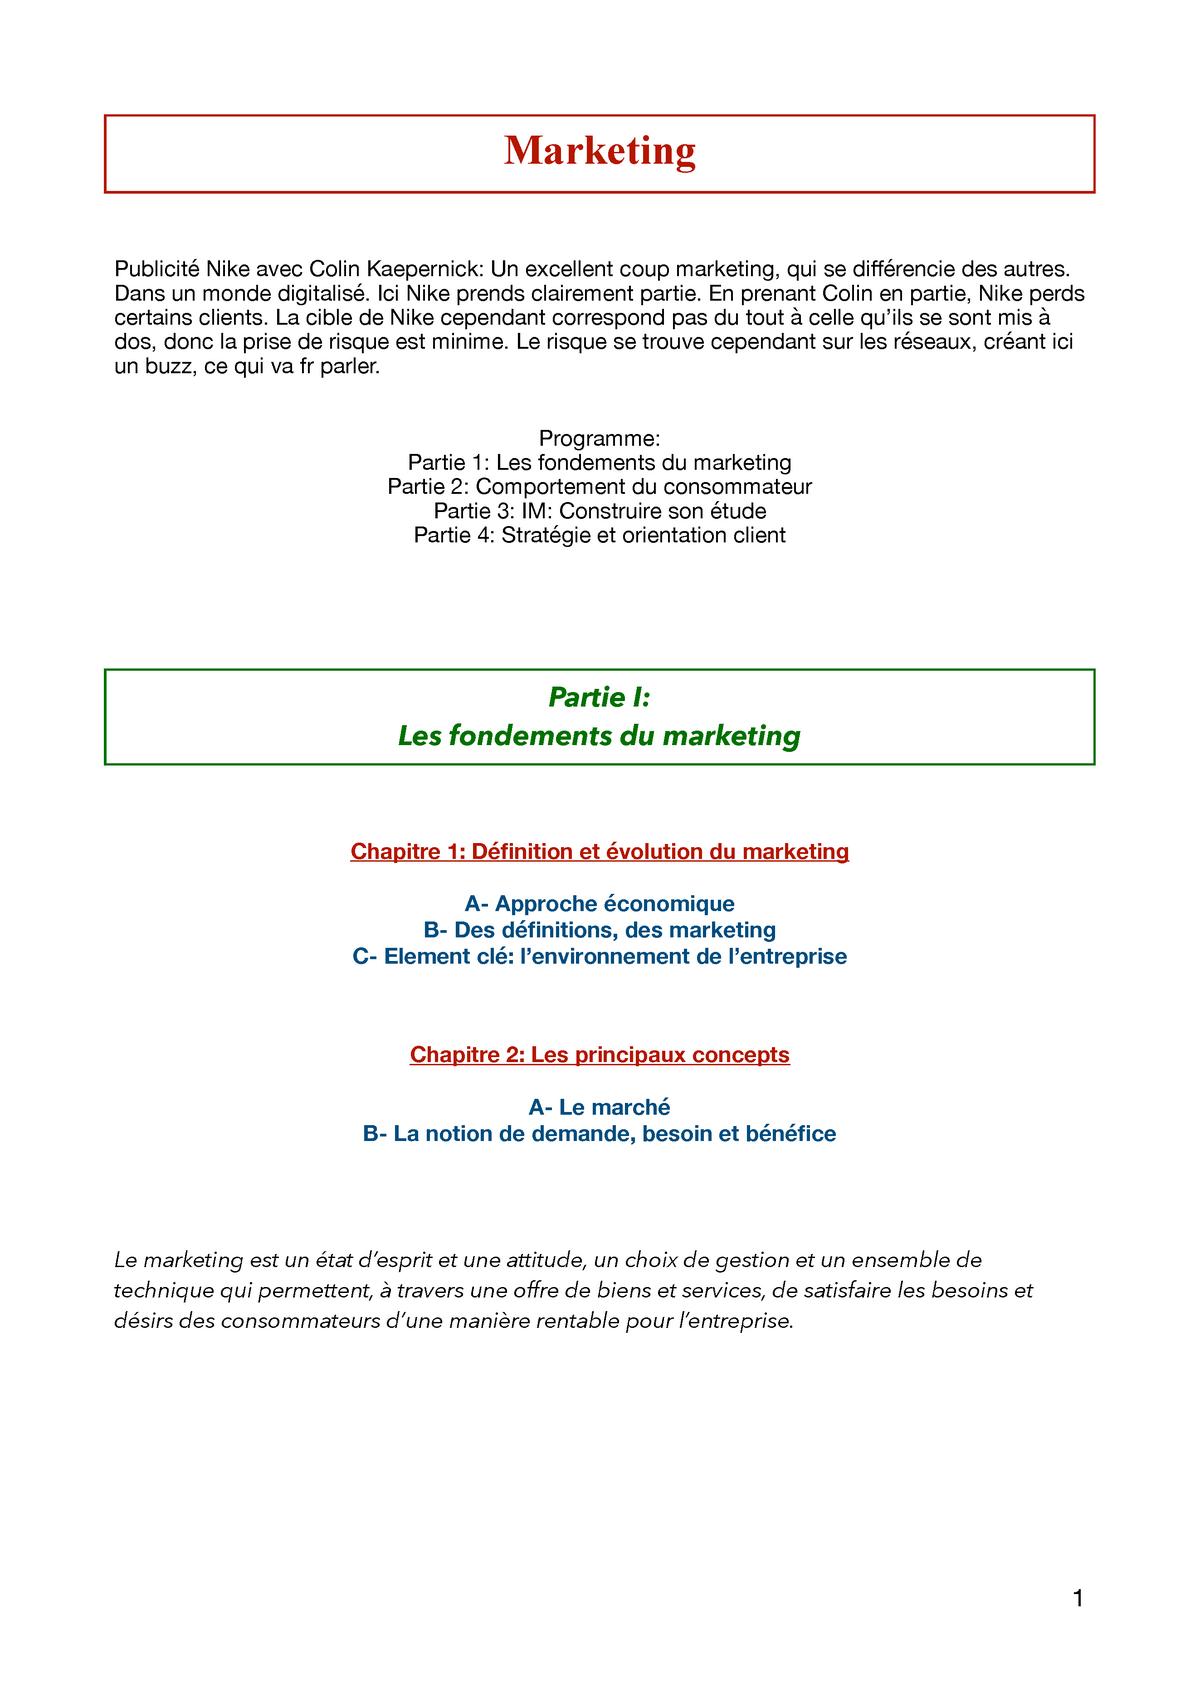 Pack para poner estoy de acuerdo con formato  Analyse Stratégie Marketing Marketing Nike avec Colin Kaepernick Un  excellent - StuDocu